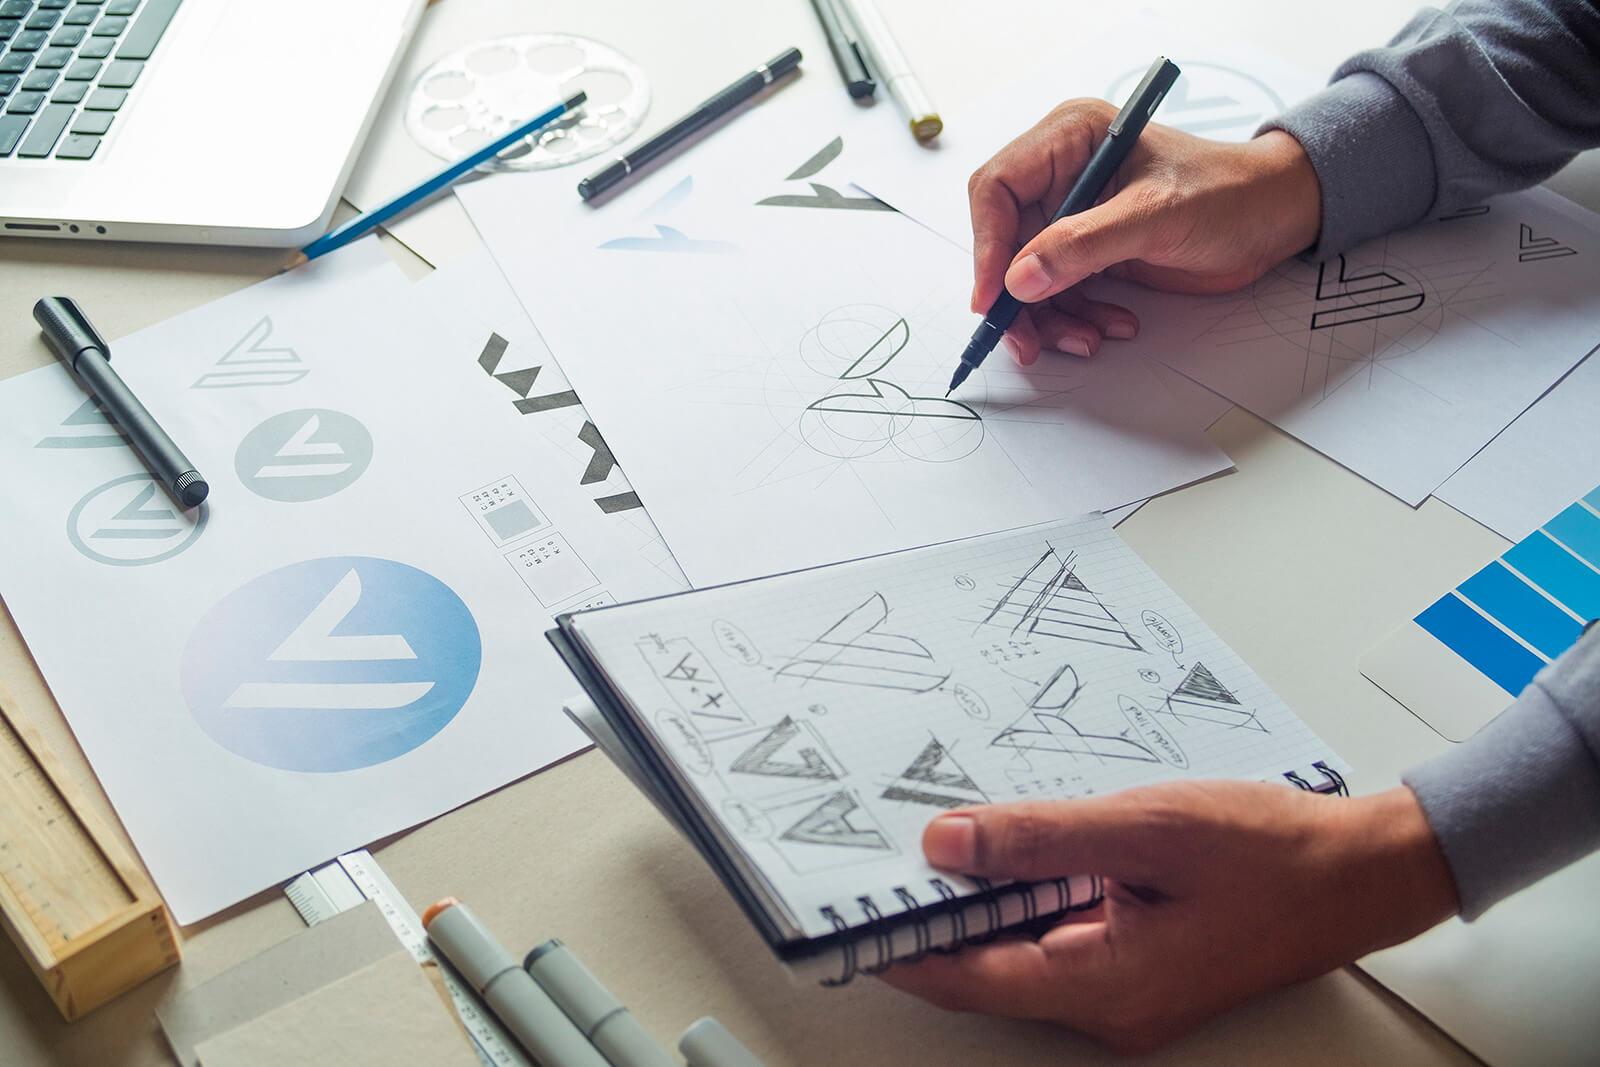 Intranet brand creation